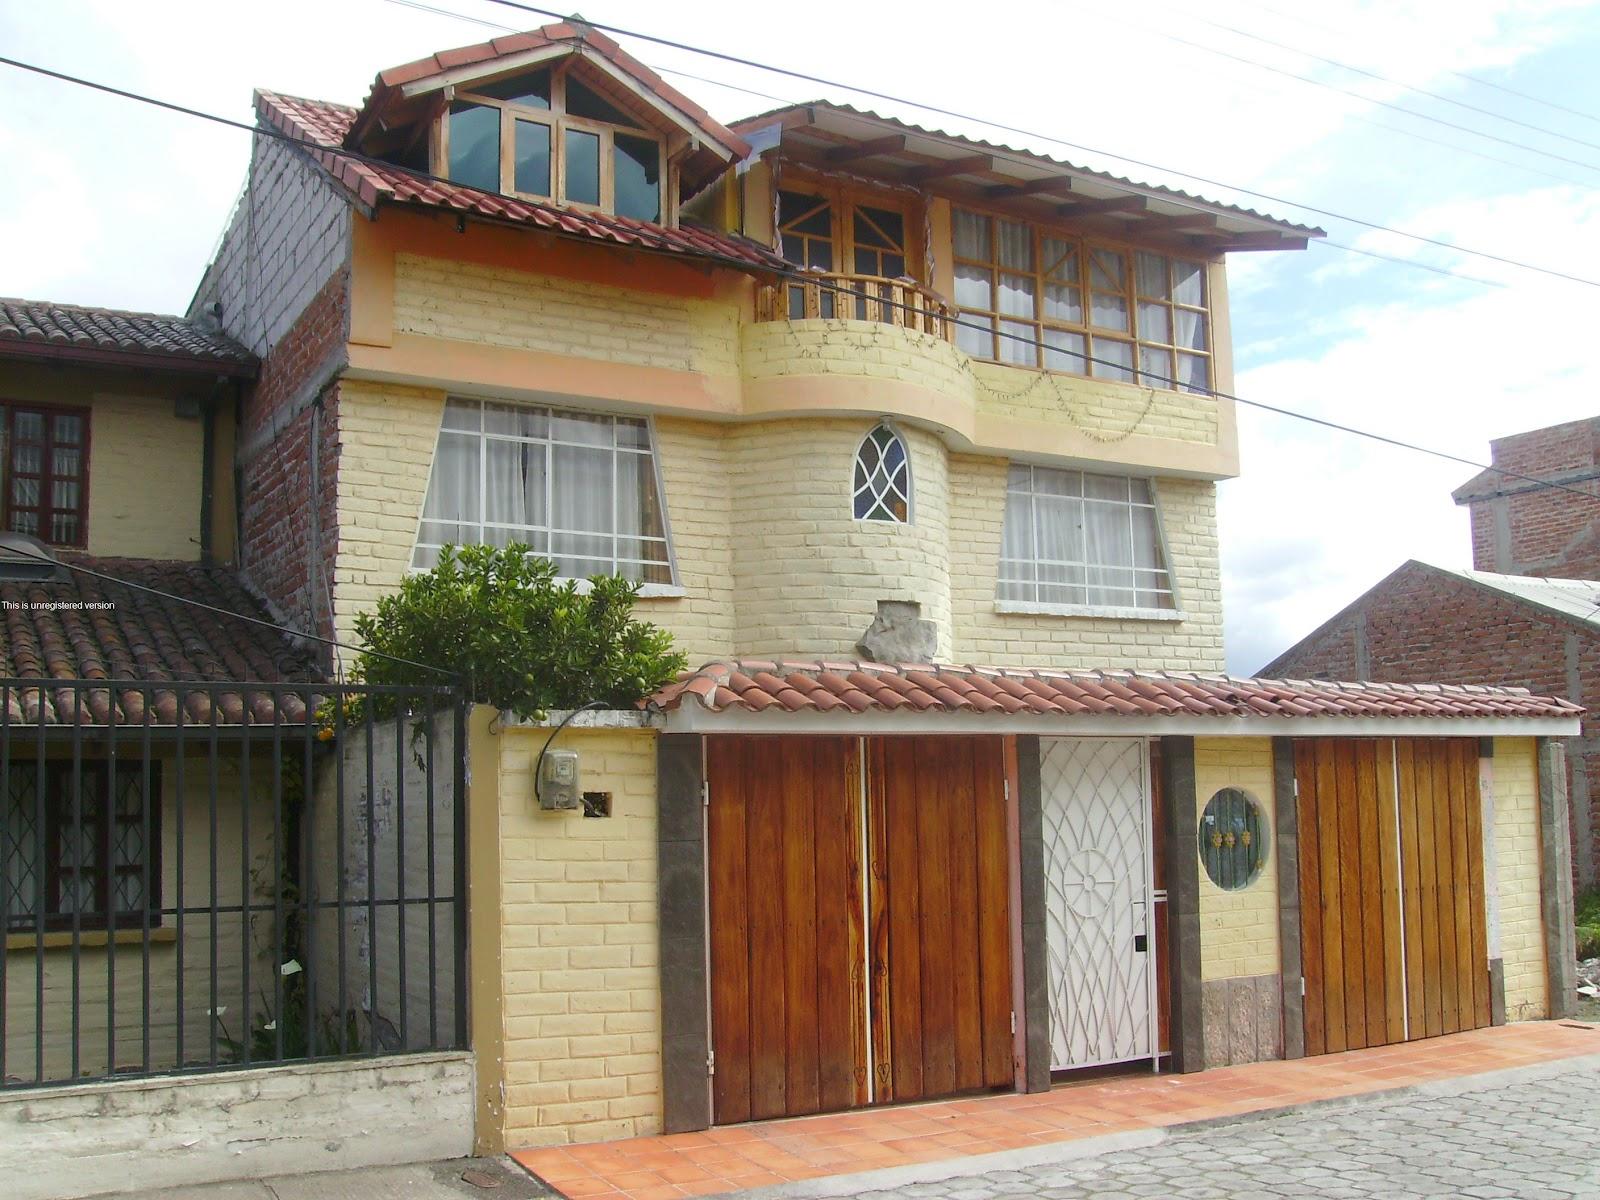 Casa bonita en venta al norte de riobamba casa en venta al norte de riobamba - Cerramientos de casas ...